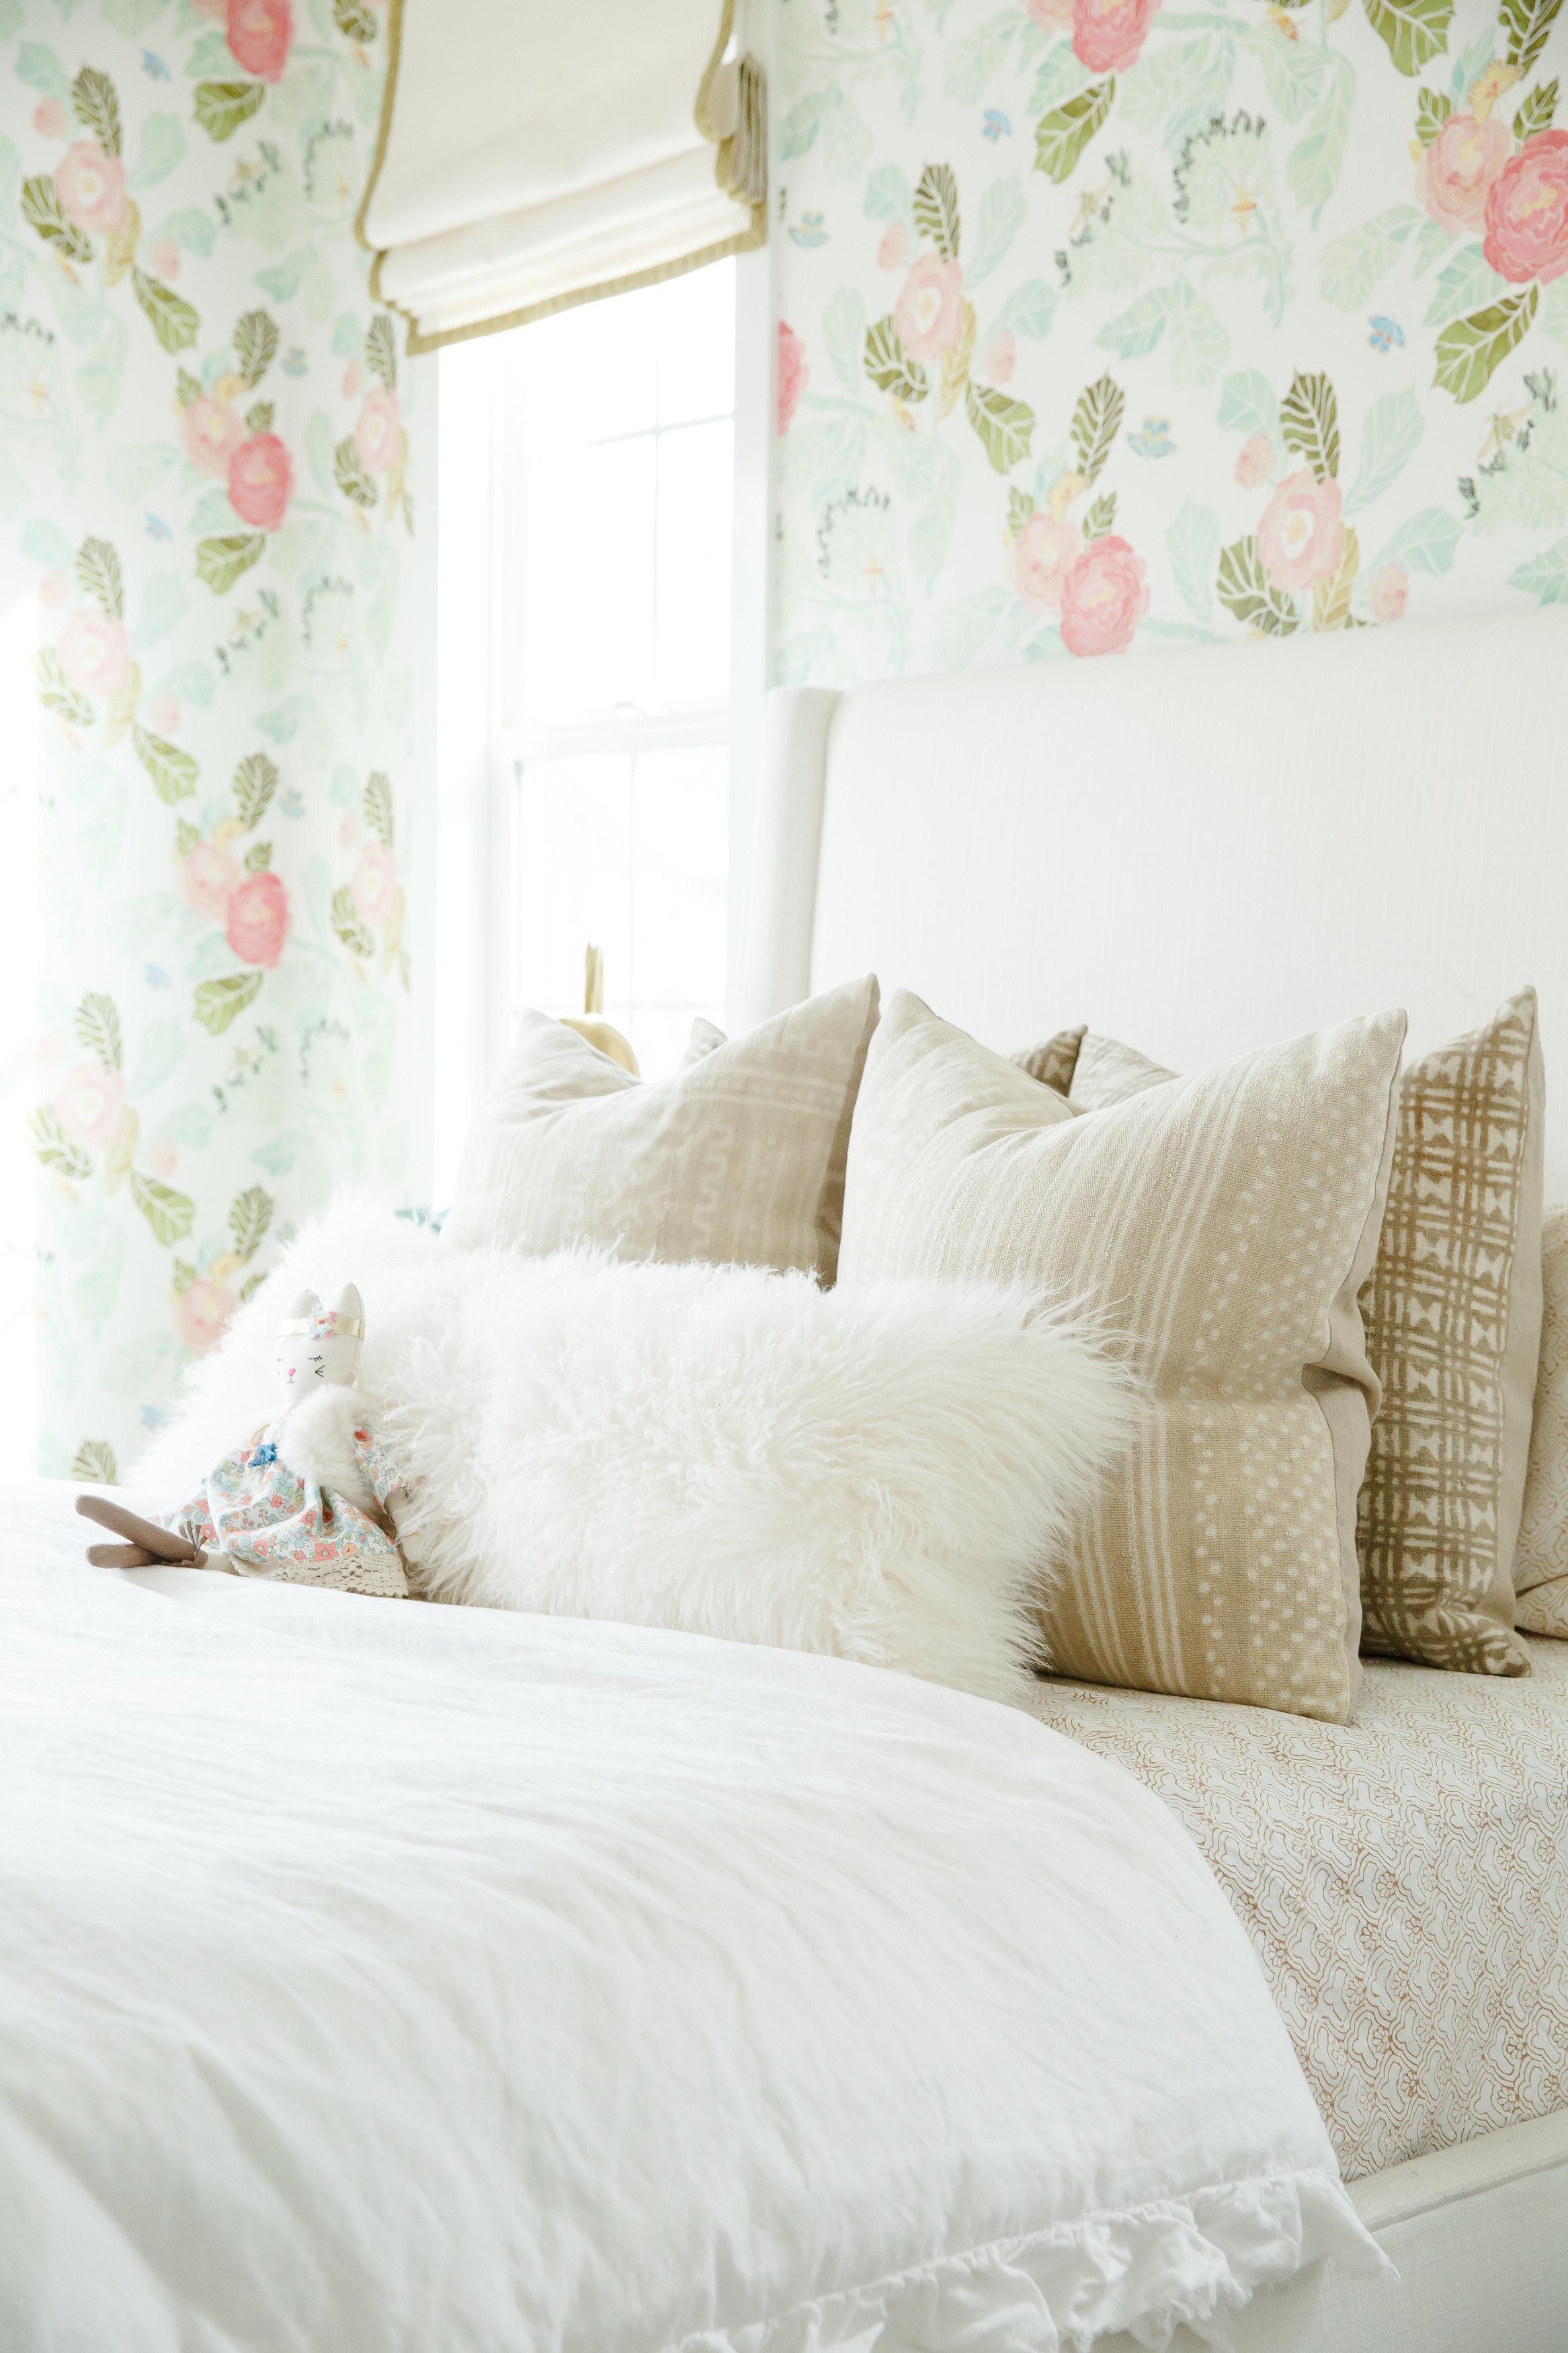 PRESLEY\'S BIG GIRL ROOM — Nicole Davis Interiors